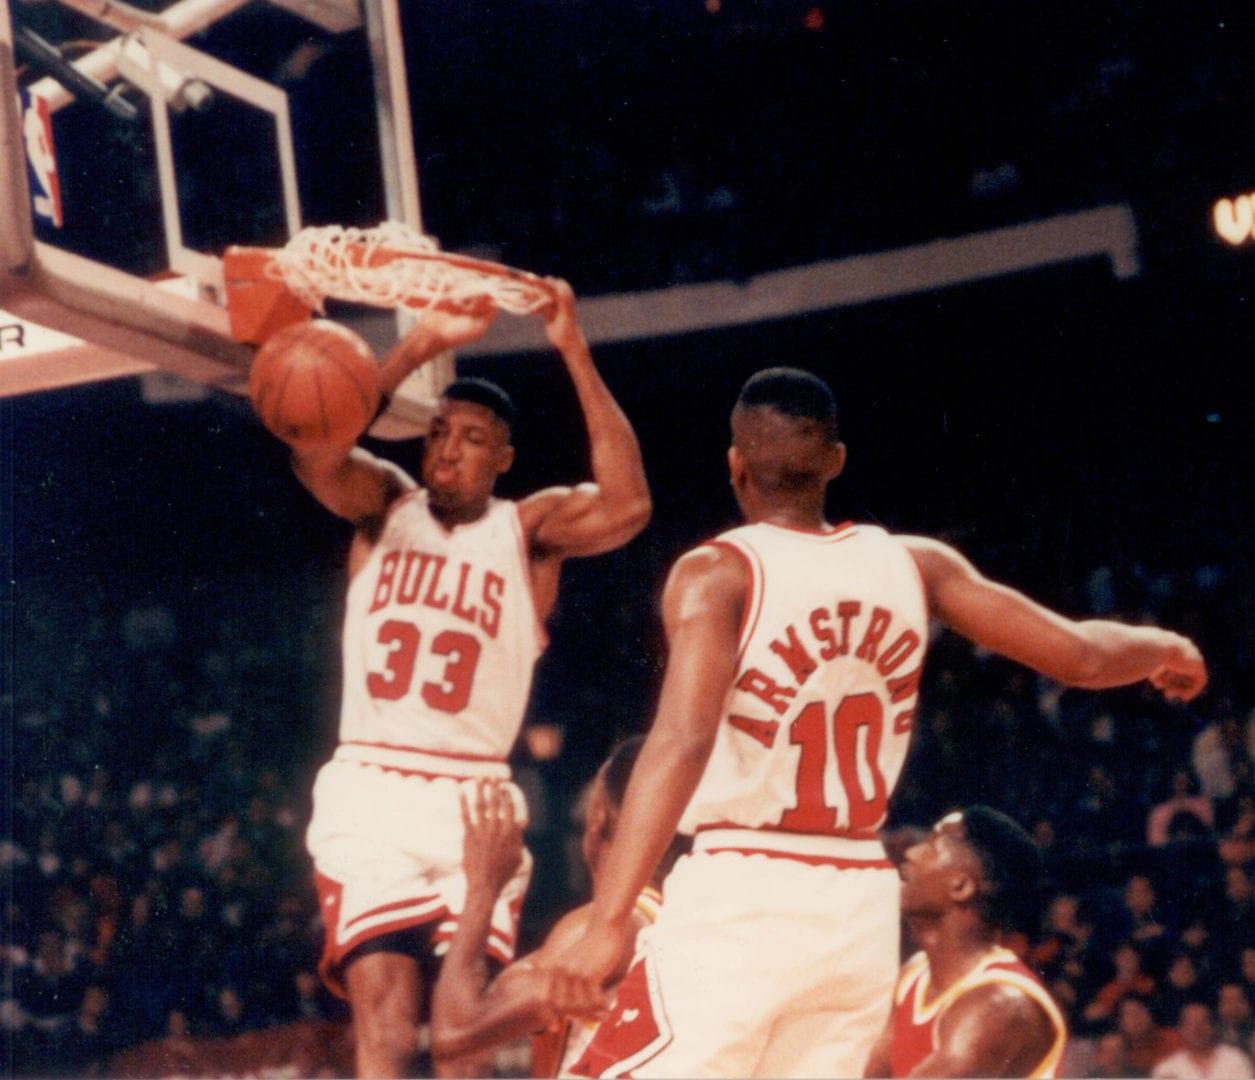 Scottie Pippen scoring from a dunk